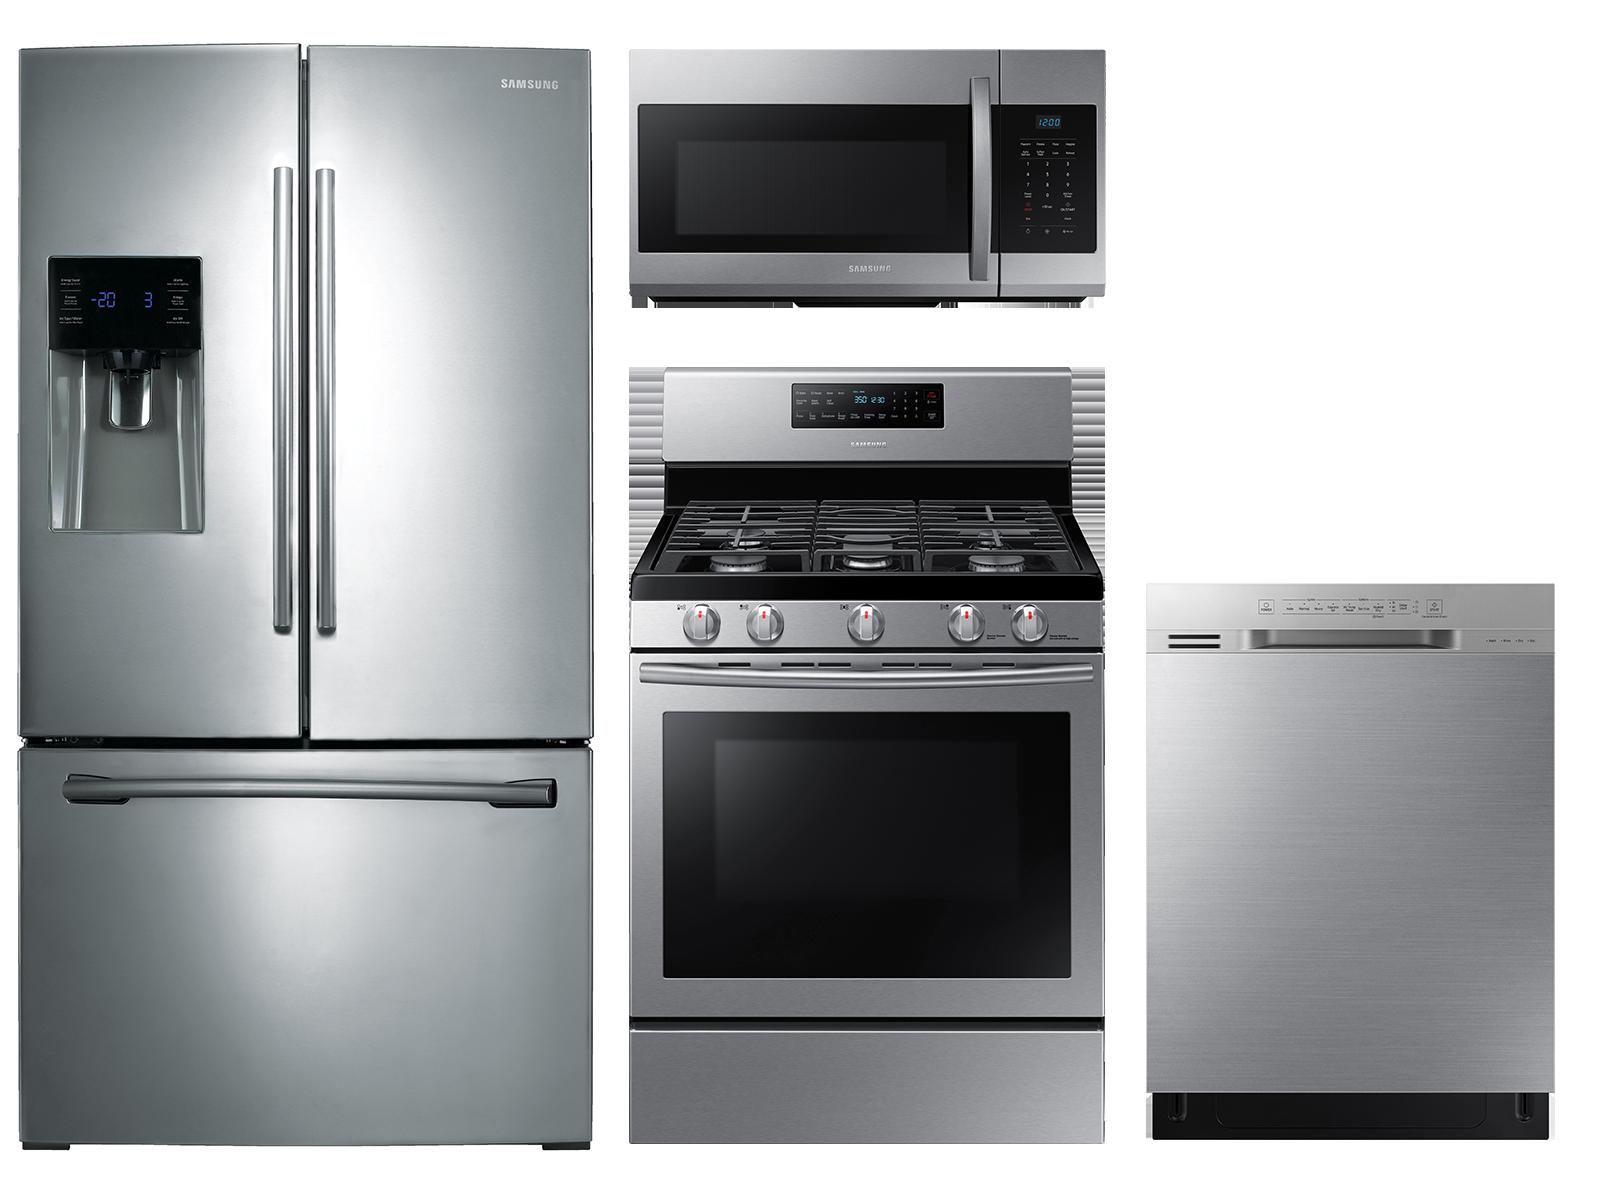 Samsung 3-door Refrigerator + Freestanding Gas Range + Dishwasher + Microwave Kitchen Package in Stainless Steel